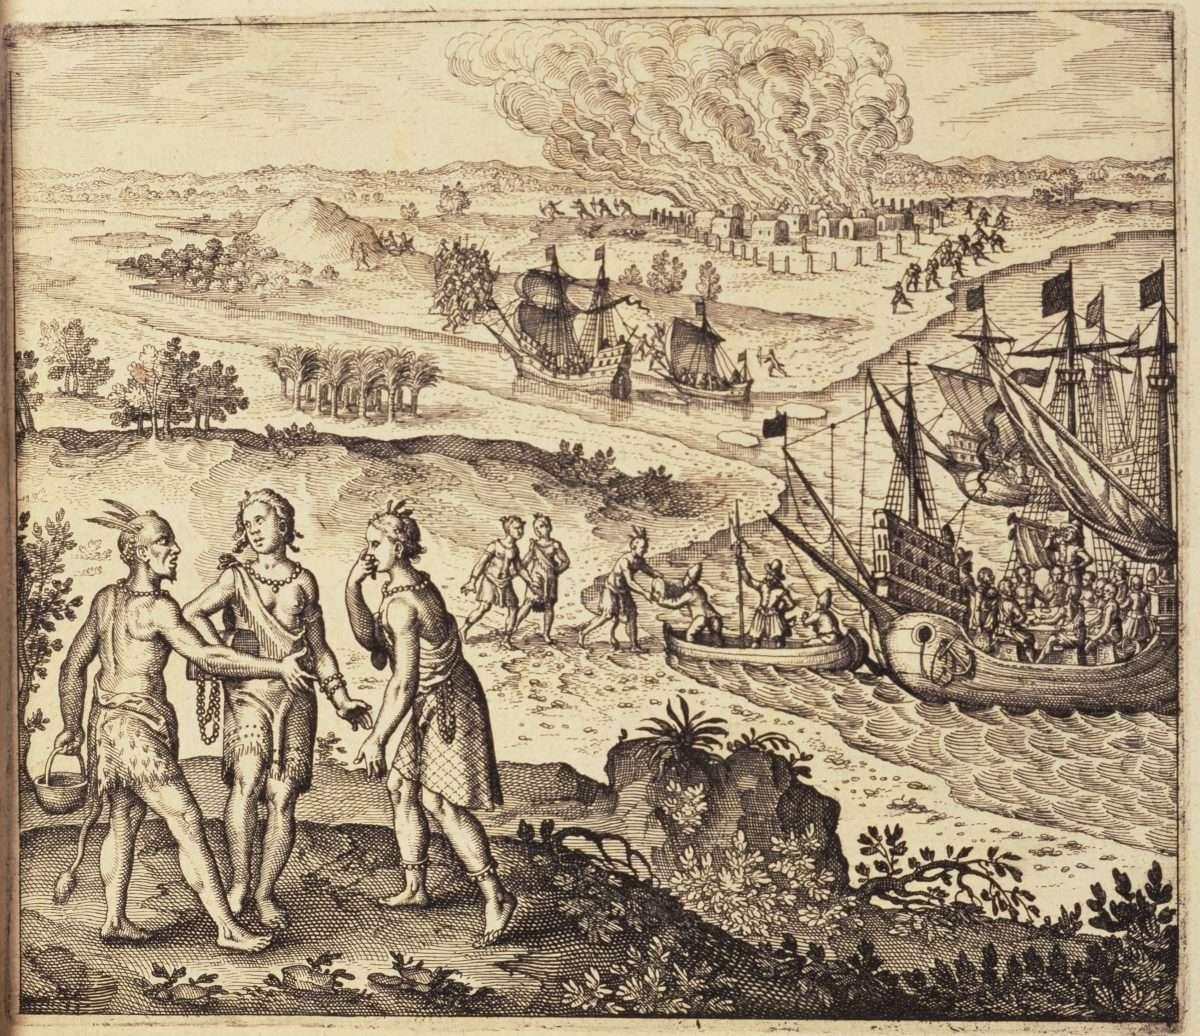 Abduction of Pocahontas